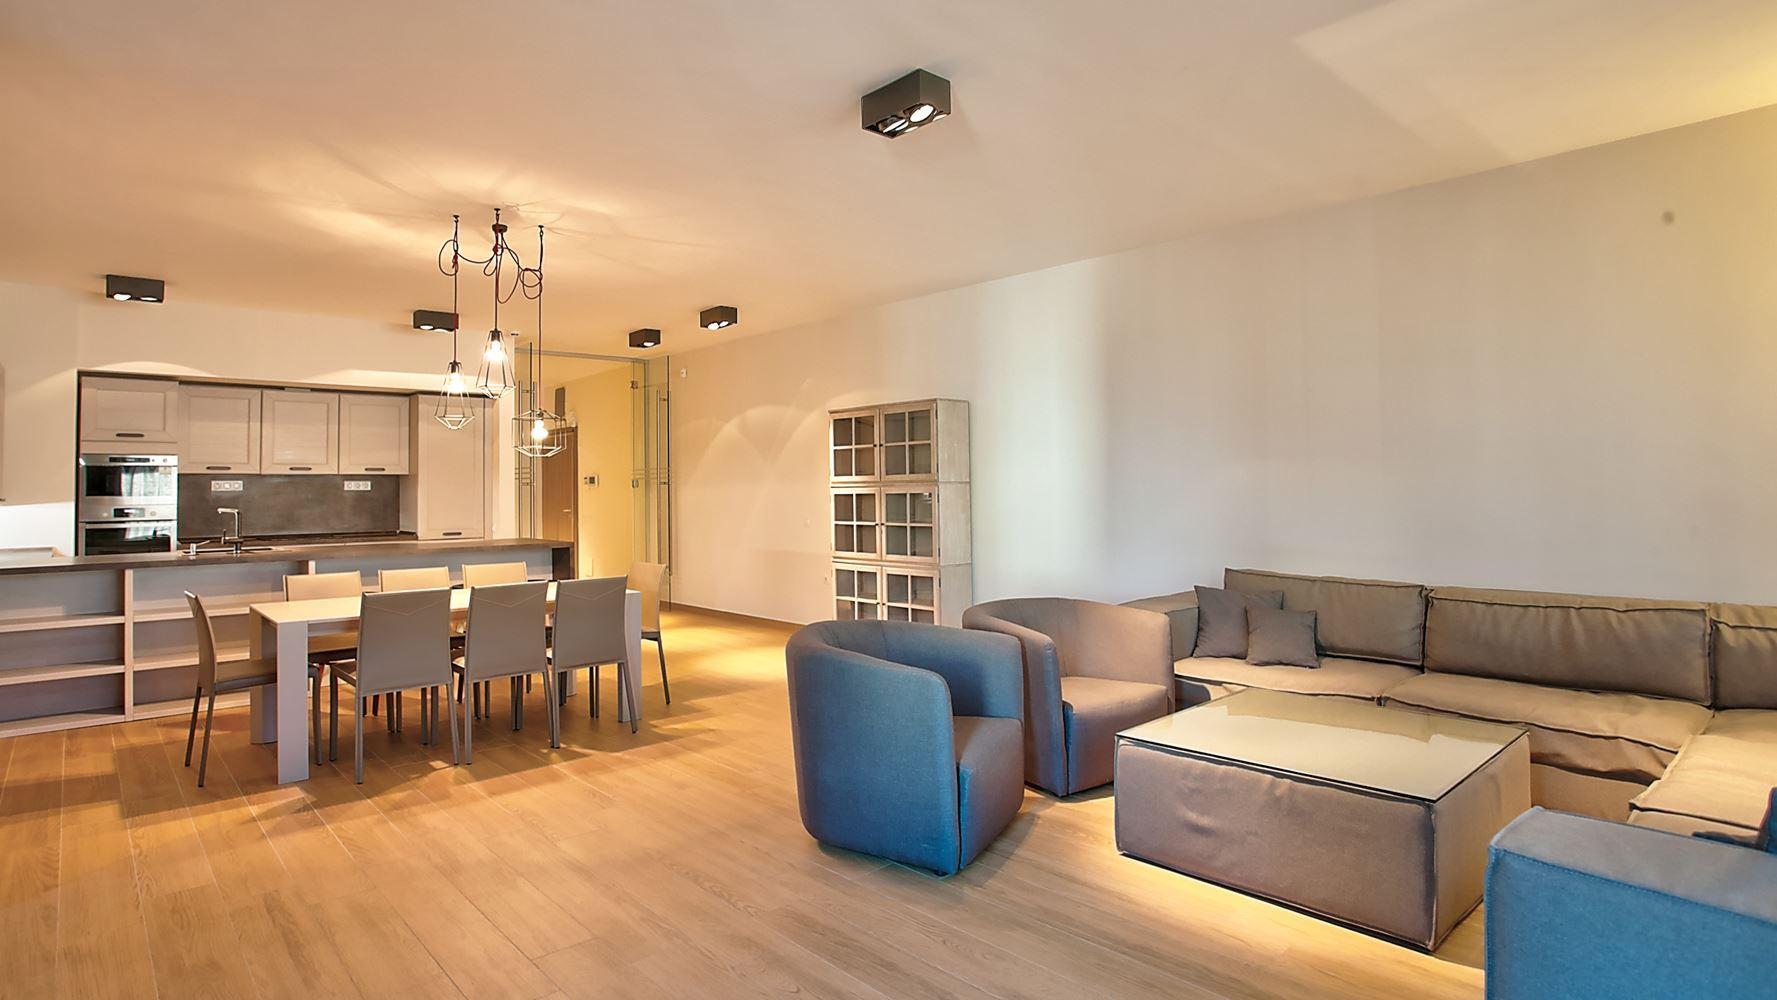 3-bedroom Apartment for Rent, Izgrev